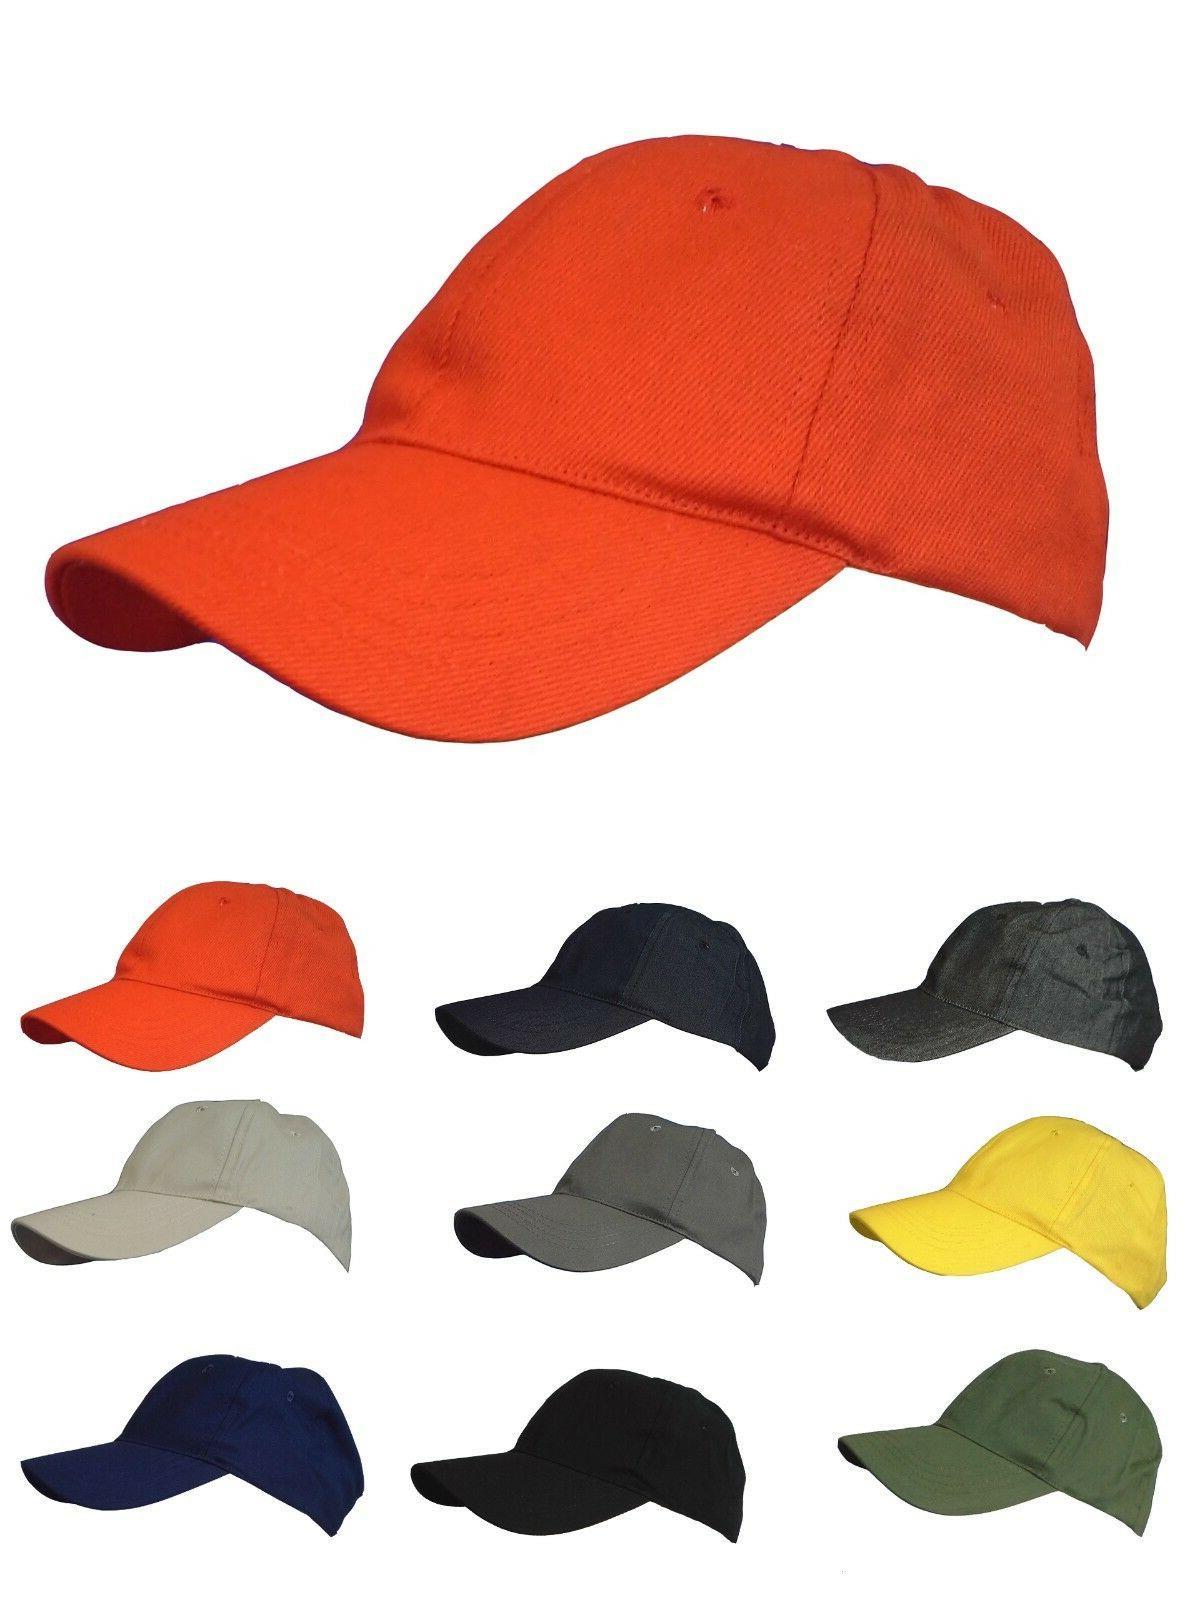 Masraze Plain Cotton Baseball Men/Women Hat Hats Adjustable